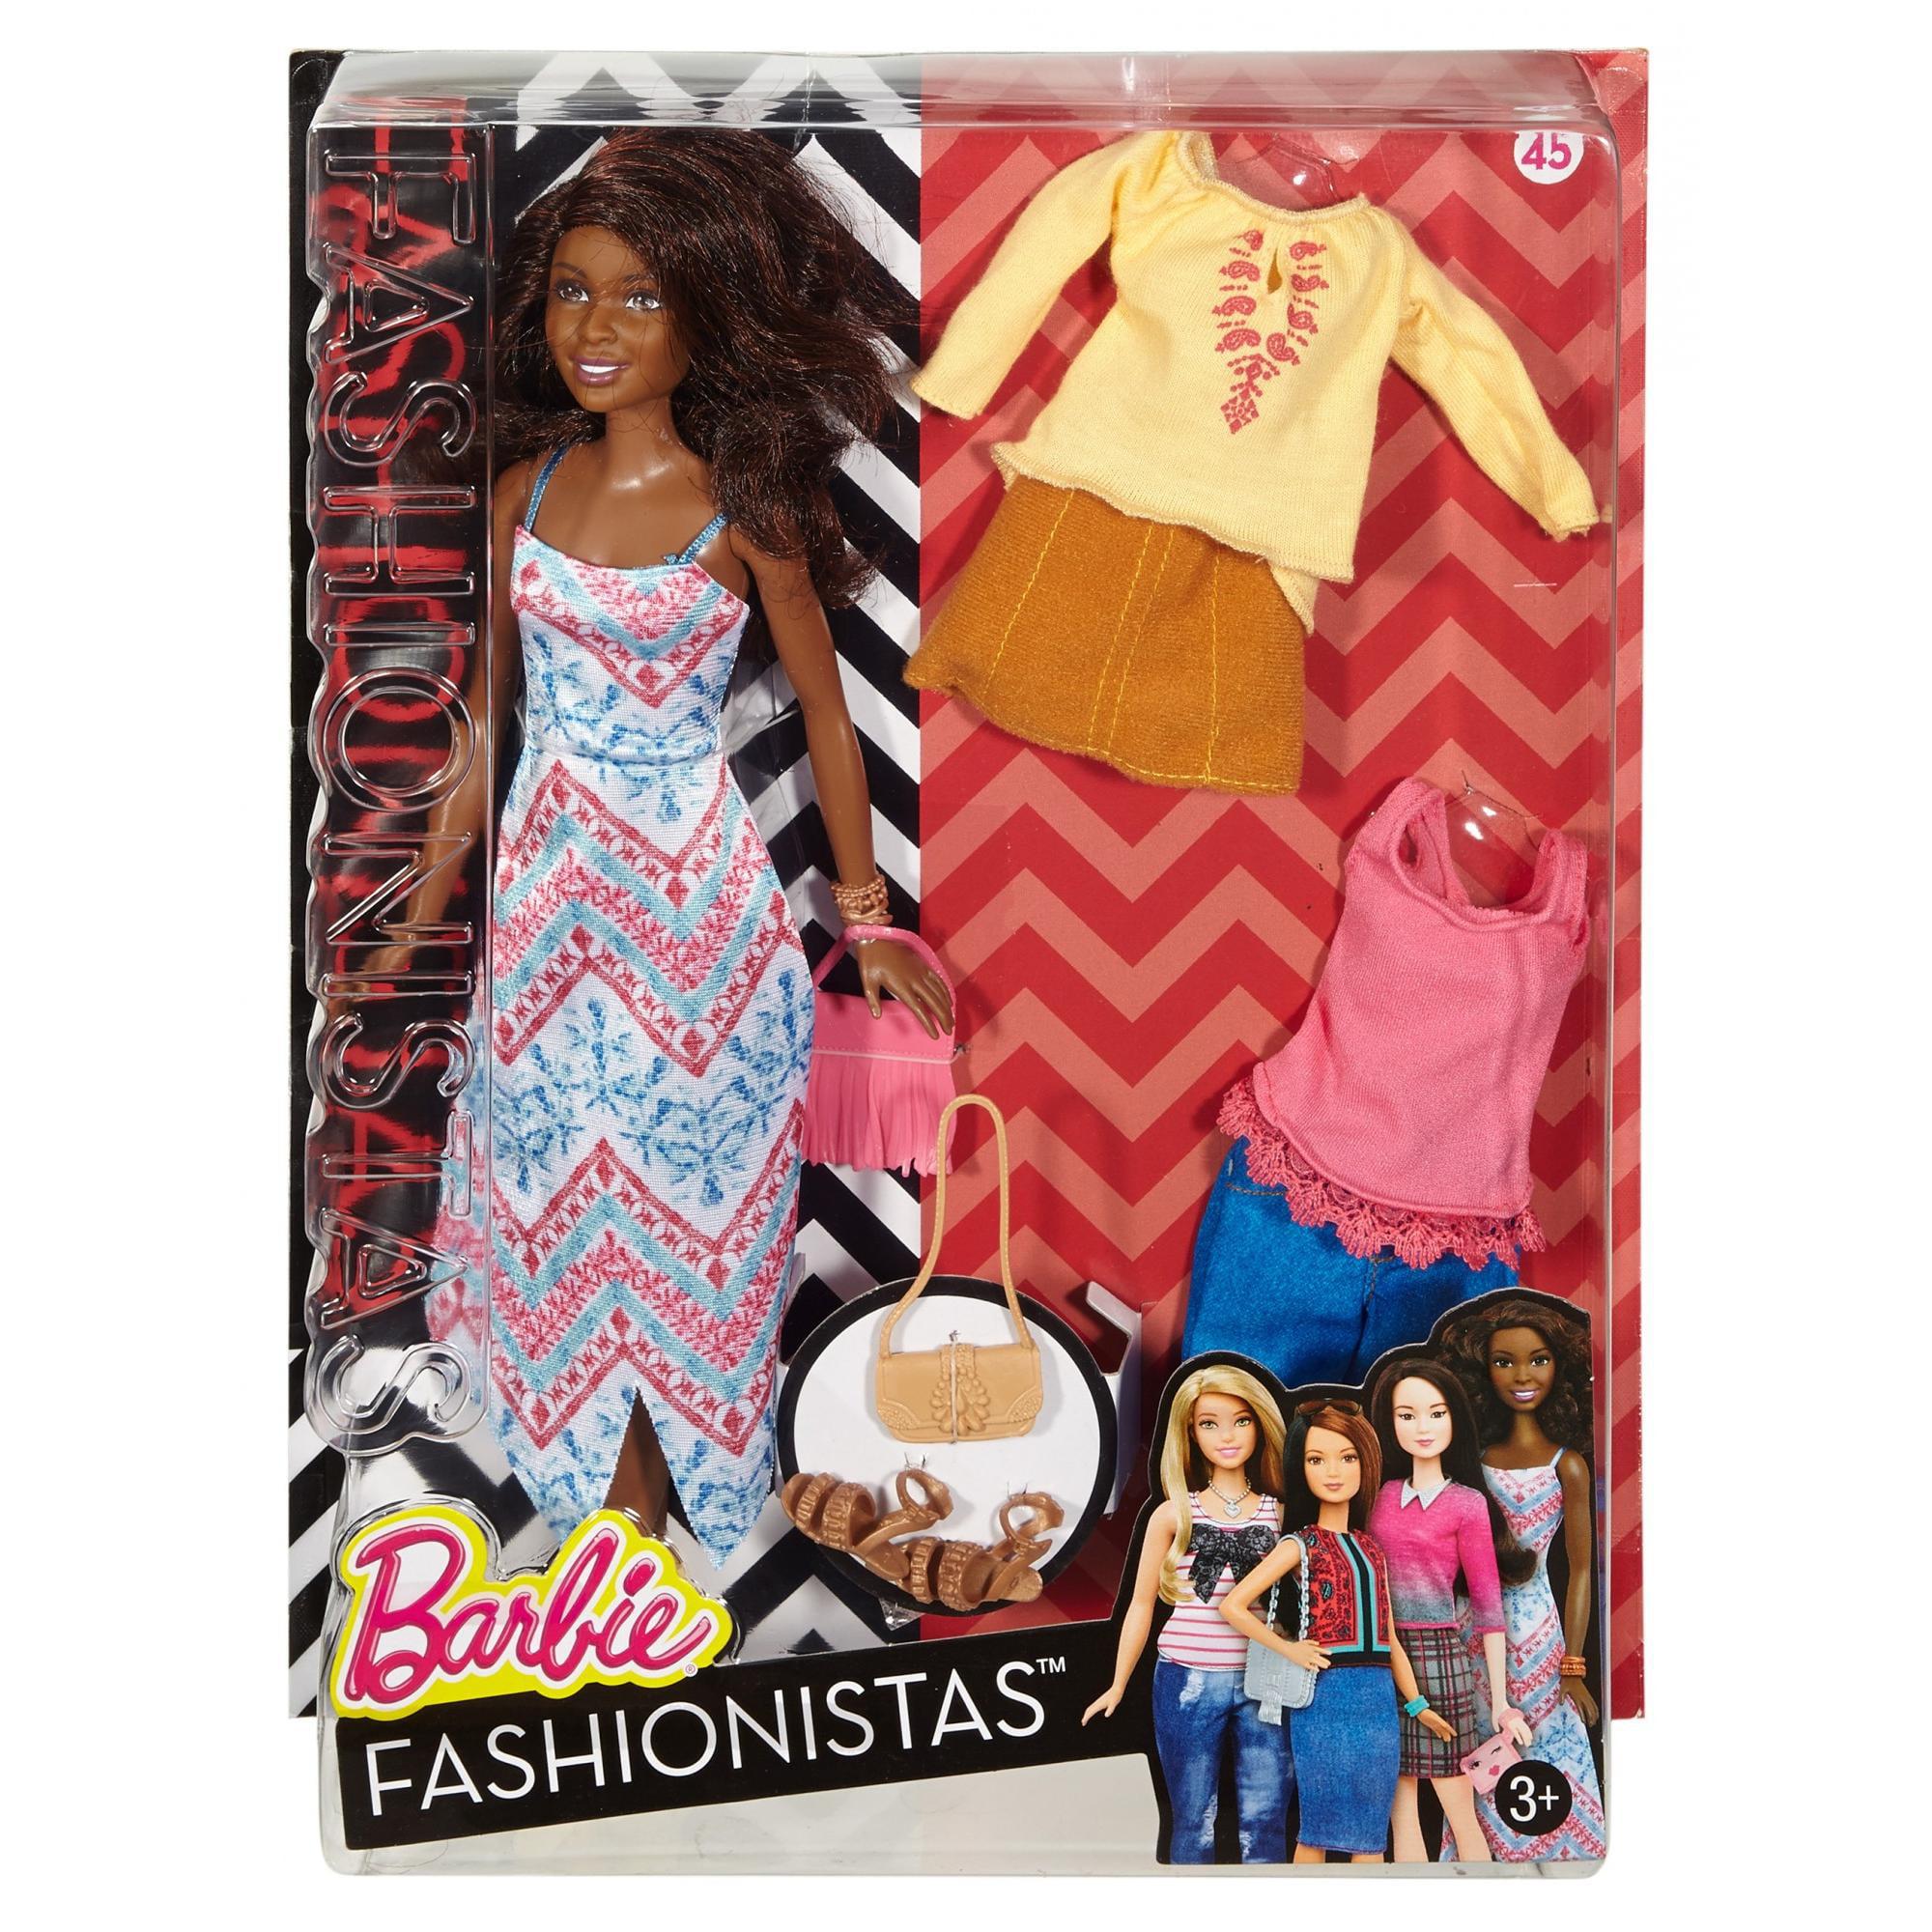 Barbie Fashionistas Doll & Fashions, Boho Fringe by MATTEL INC.